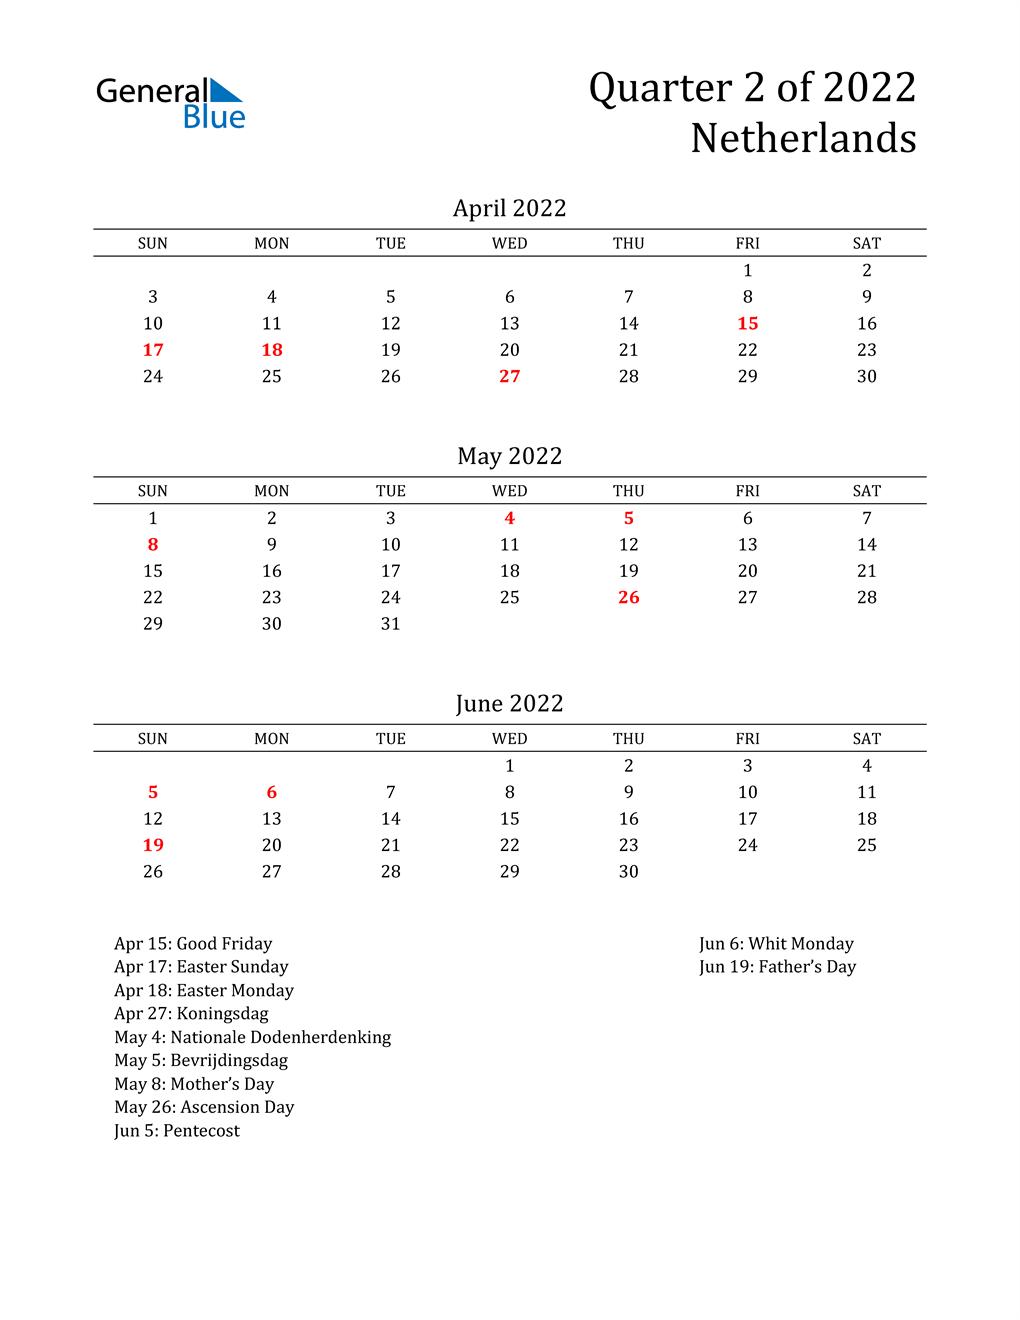 2022 Netherlands Quarterly Calendar